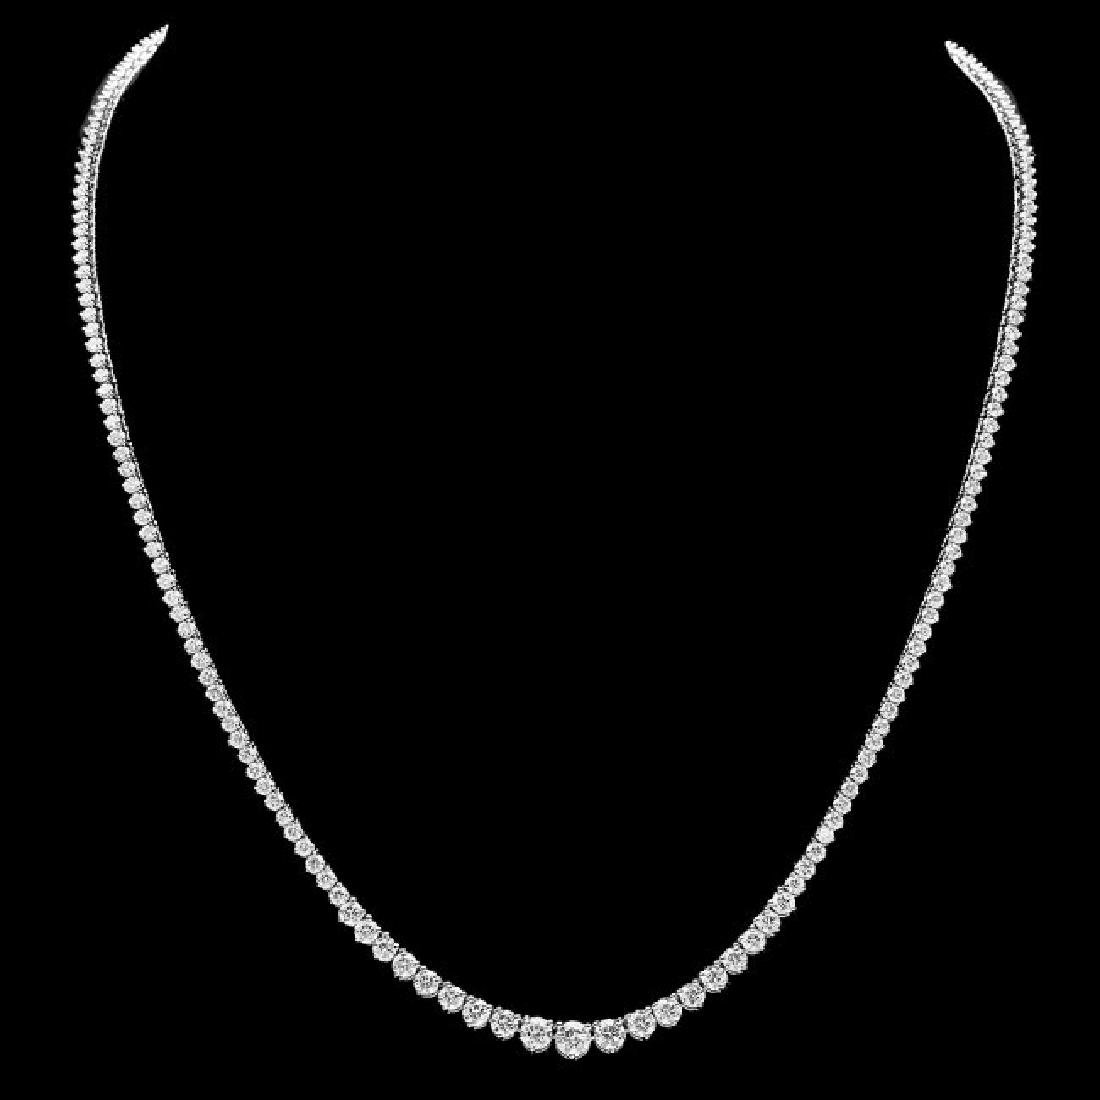 18k White Gold 9.30ct Diamond Necklace